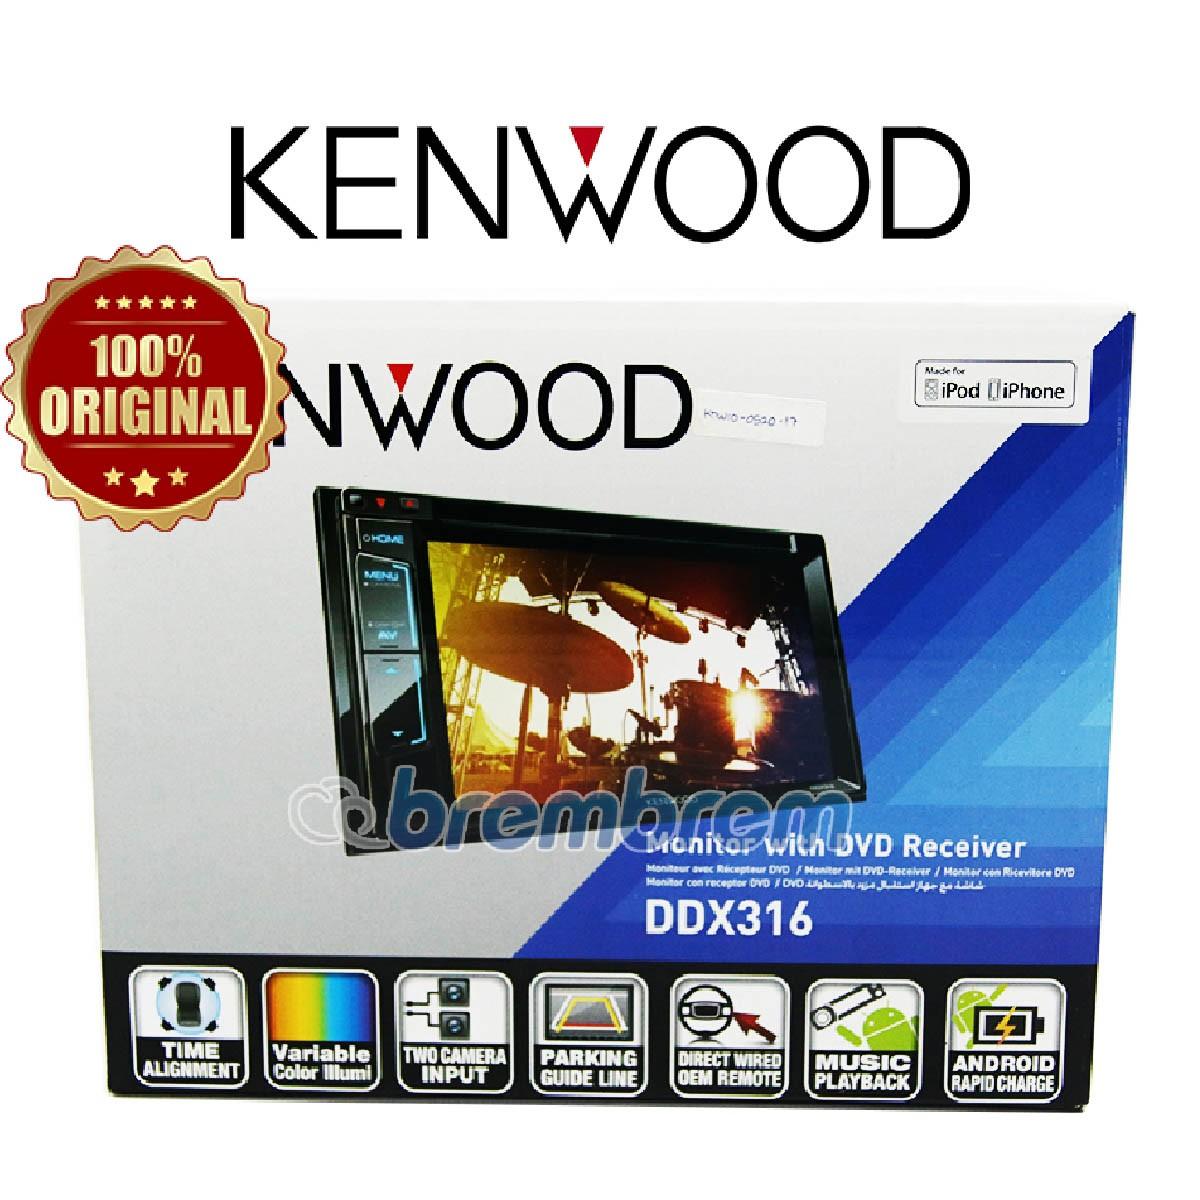 KENWOOD DDX316 - HEADUNIT DOUBLE DIN